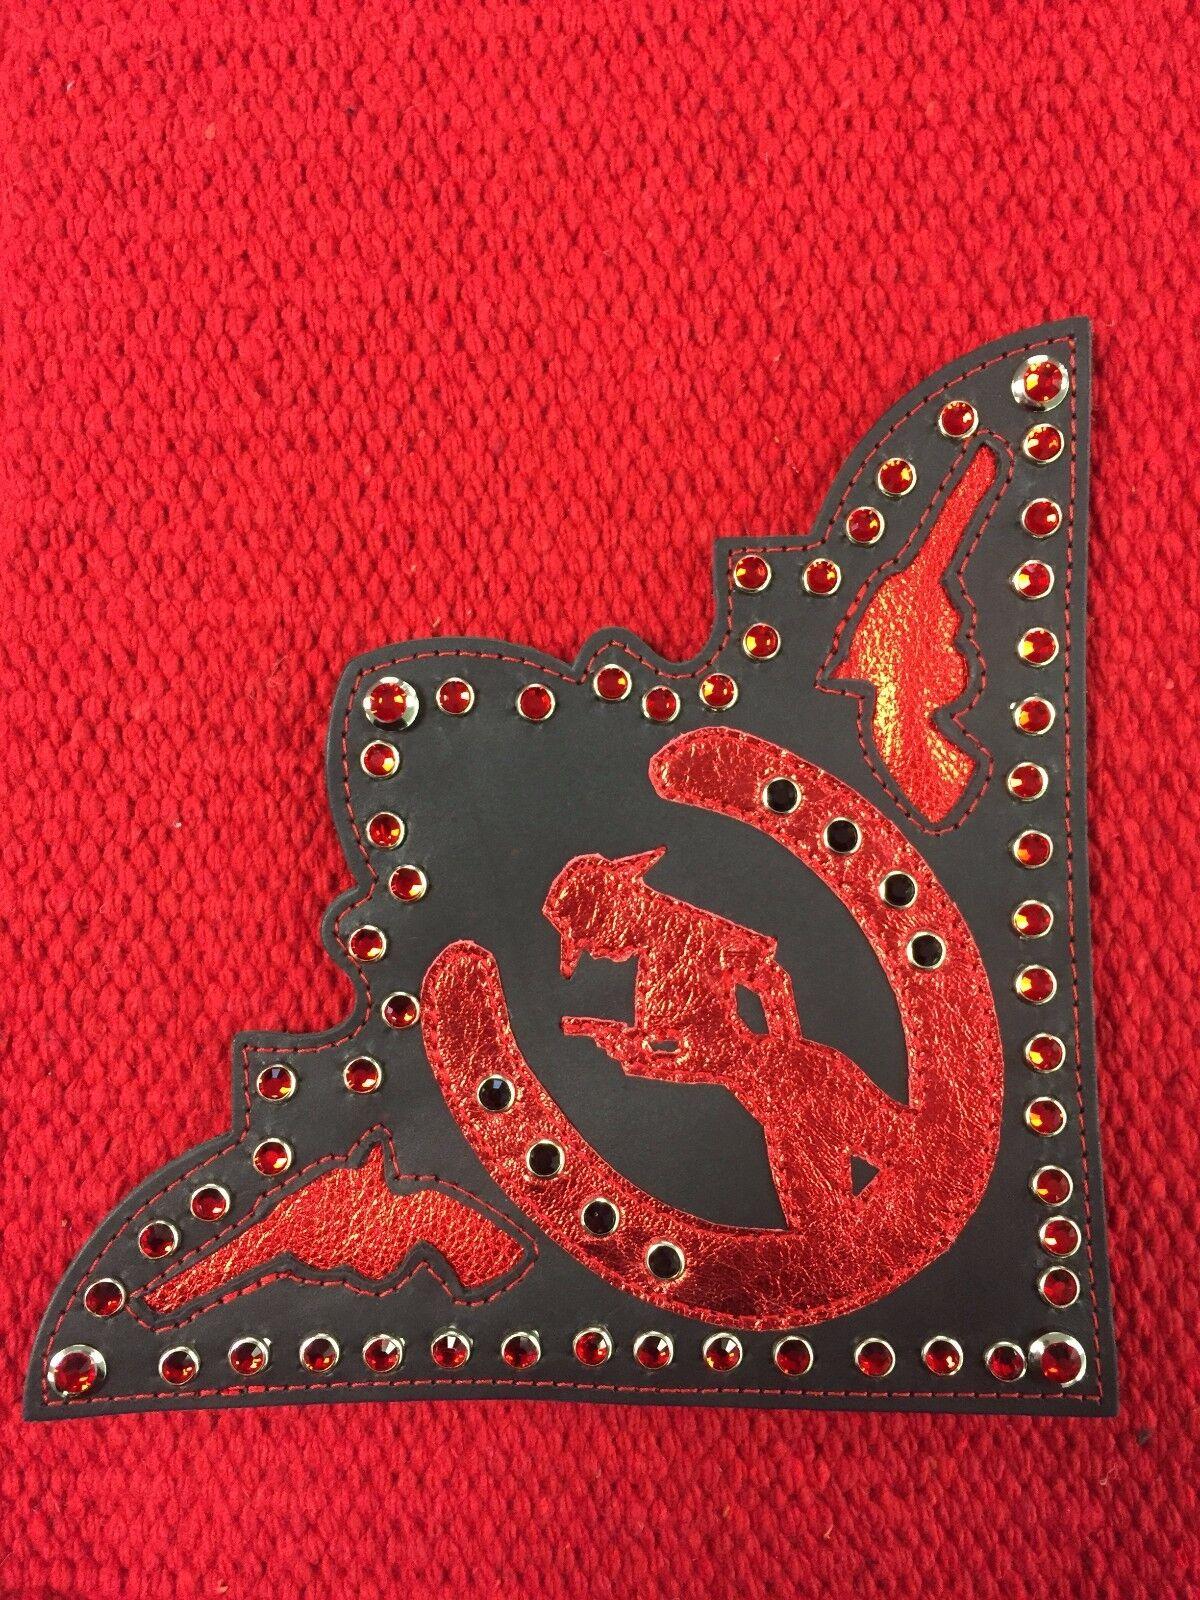 Western Saddle  Blanket Corner Pieces  Riding High USA  buy best